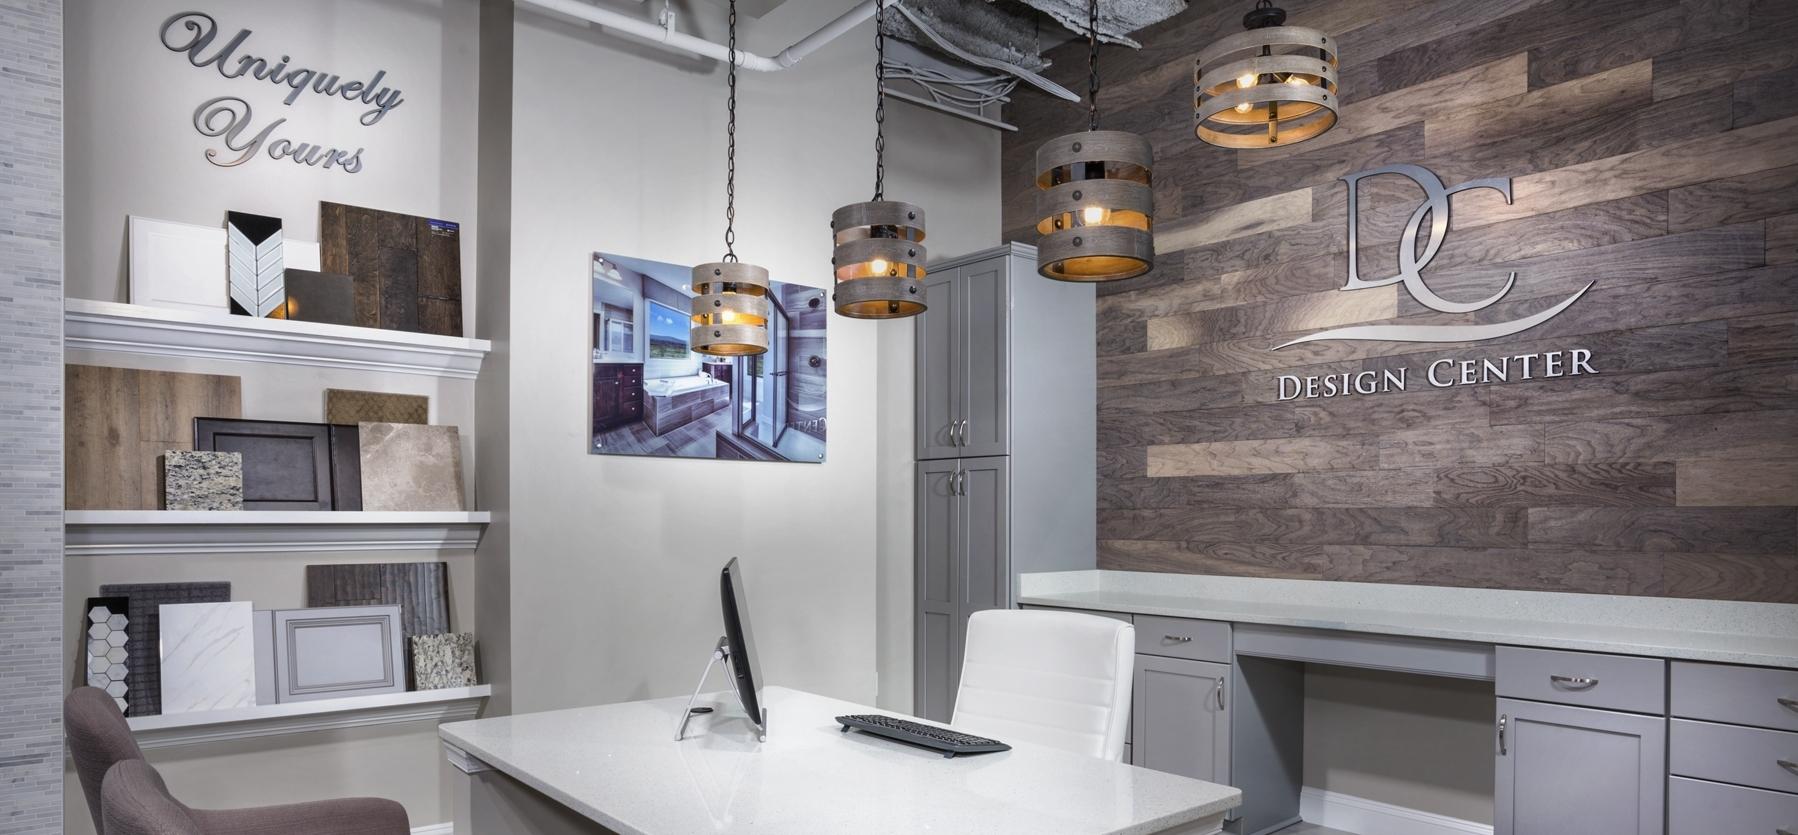 Drb Metro Design Center